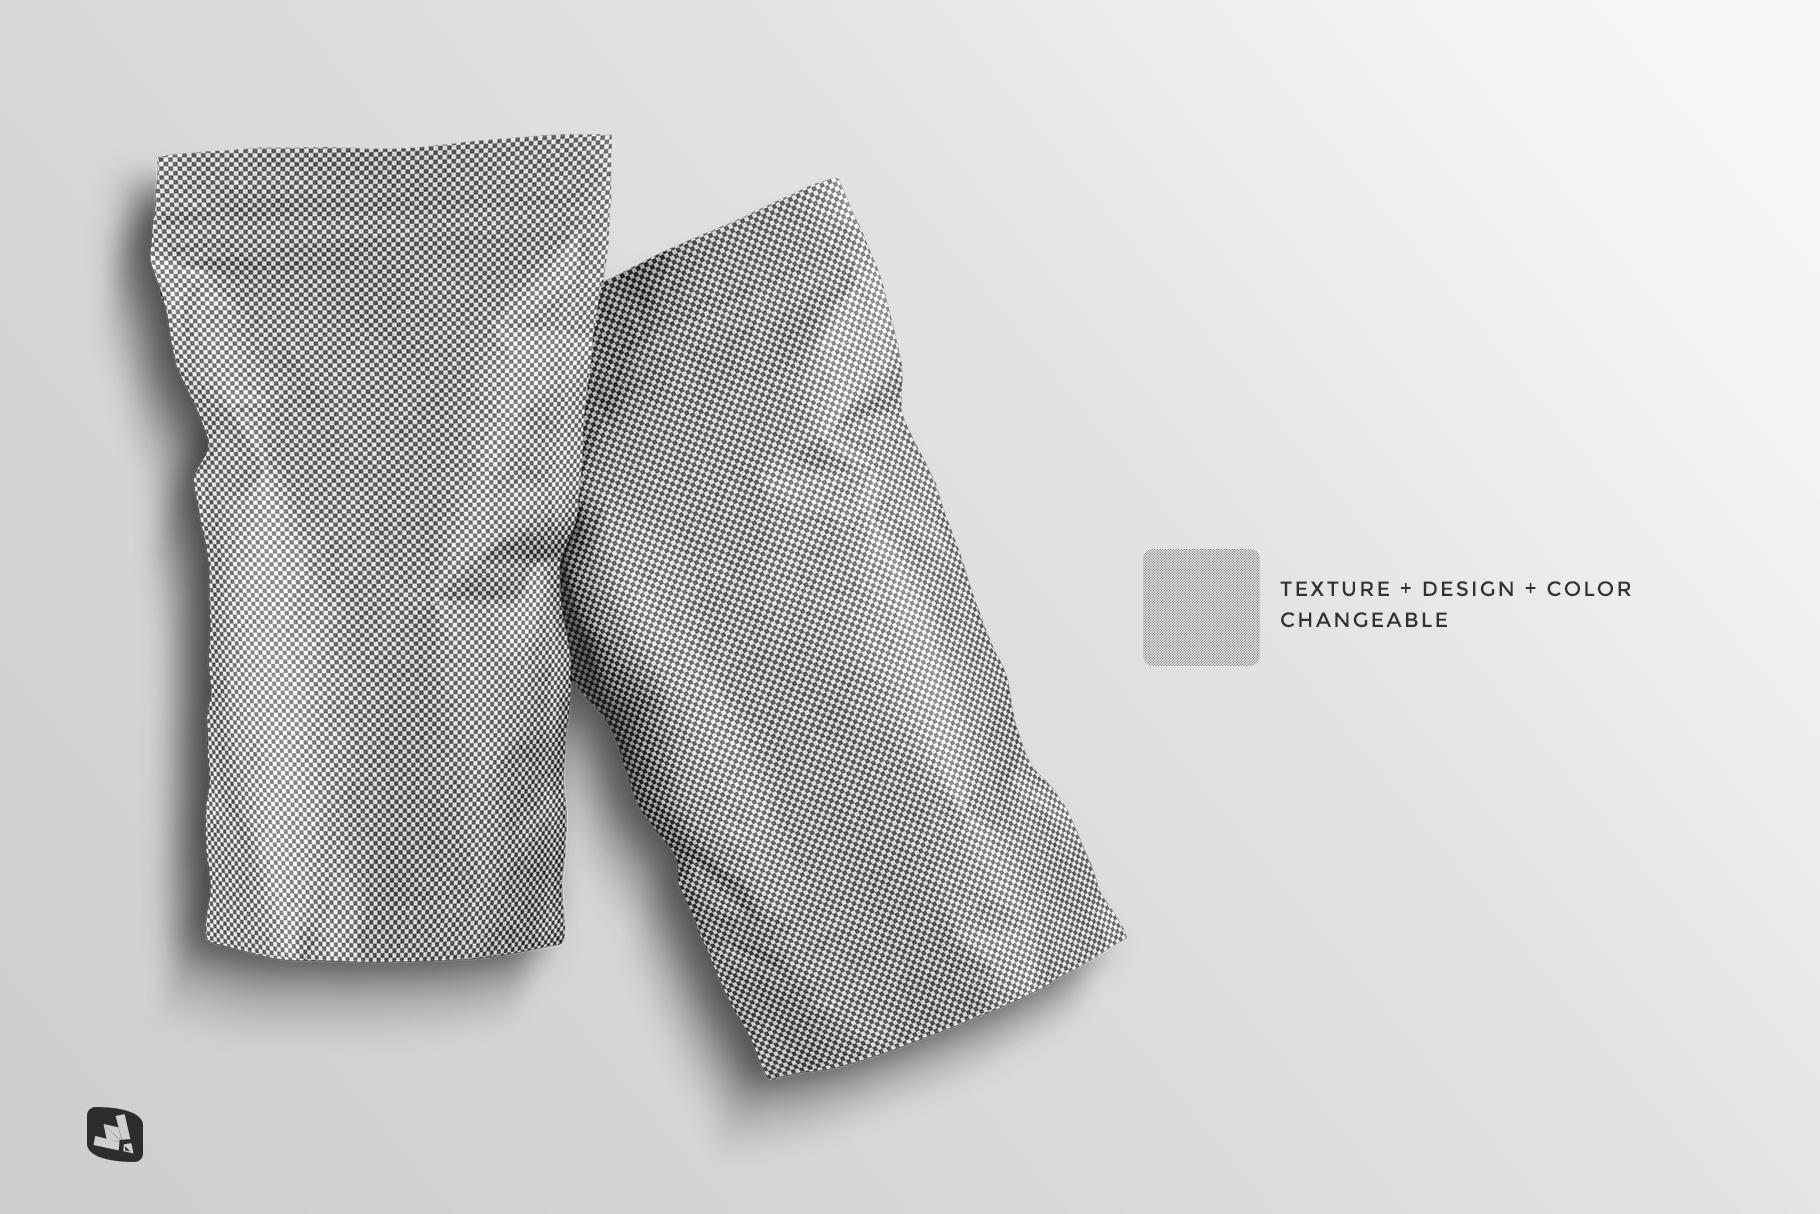 editability of the tall kraft paper packaging mockup